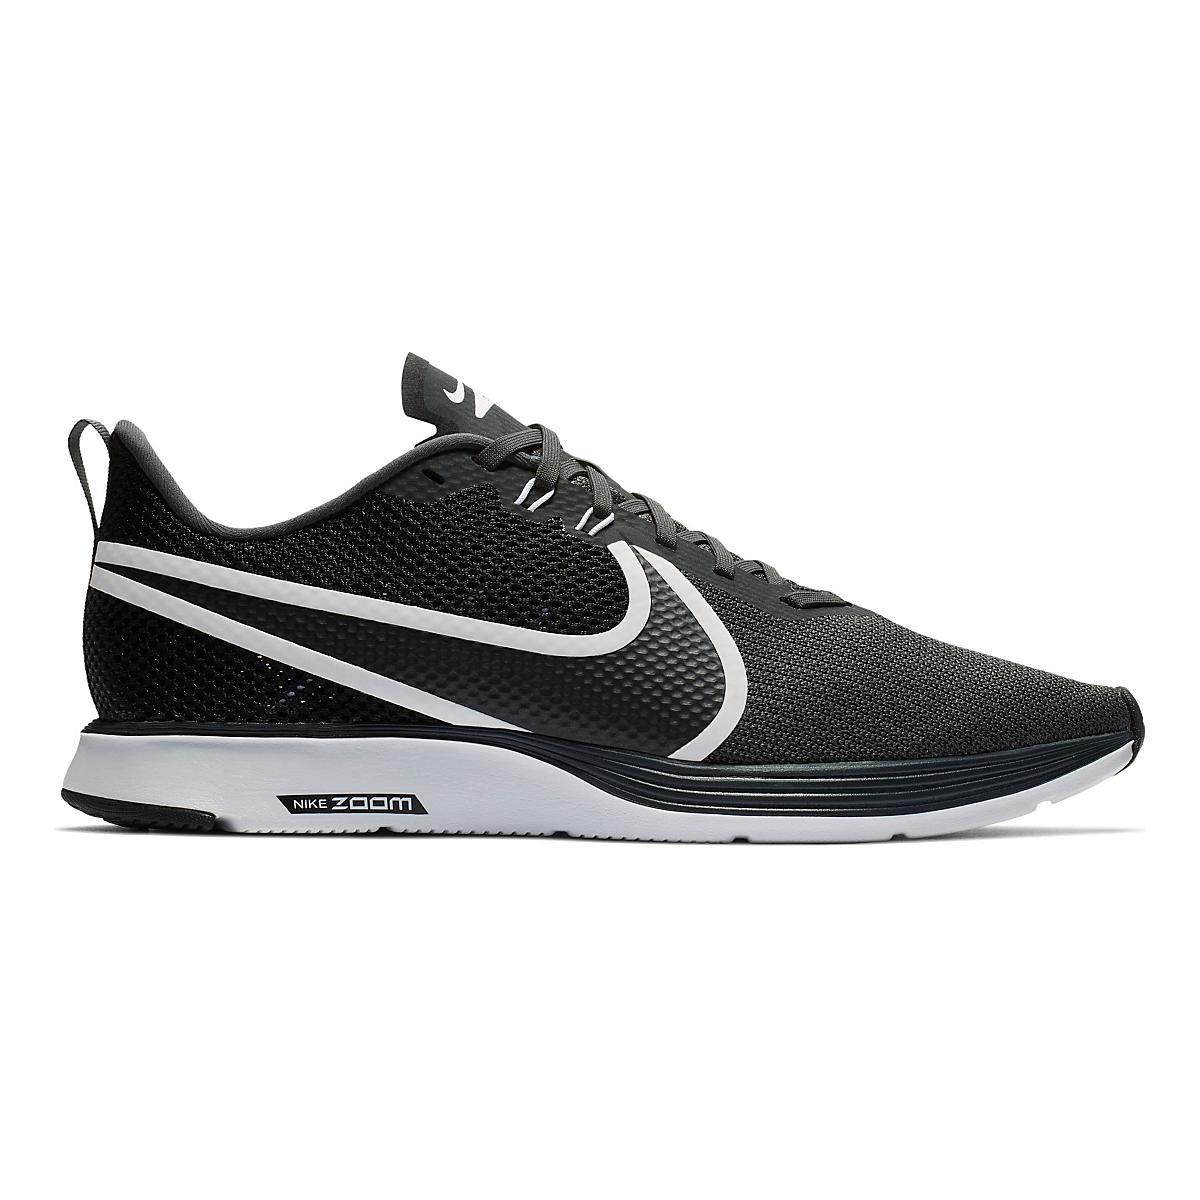 c817bc57b6122 Mens Nike Zoom Strike 2 Running Shoe at Road Runner Sports